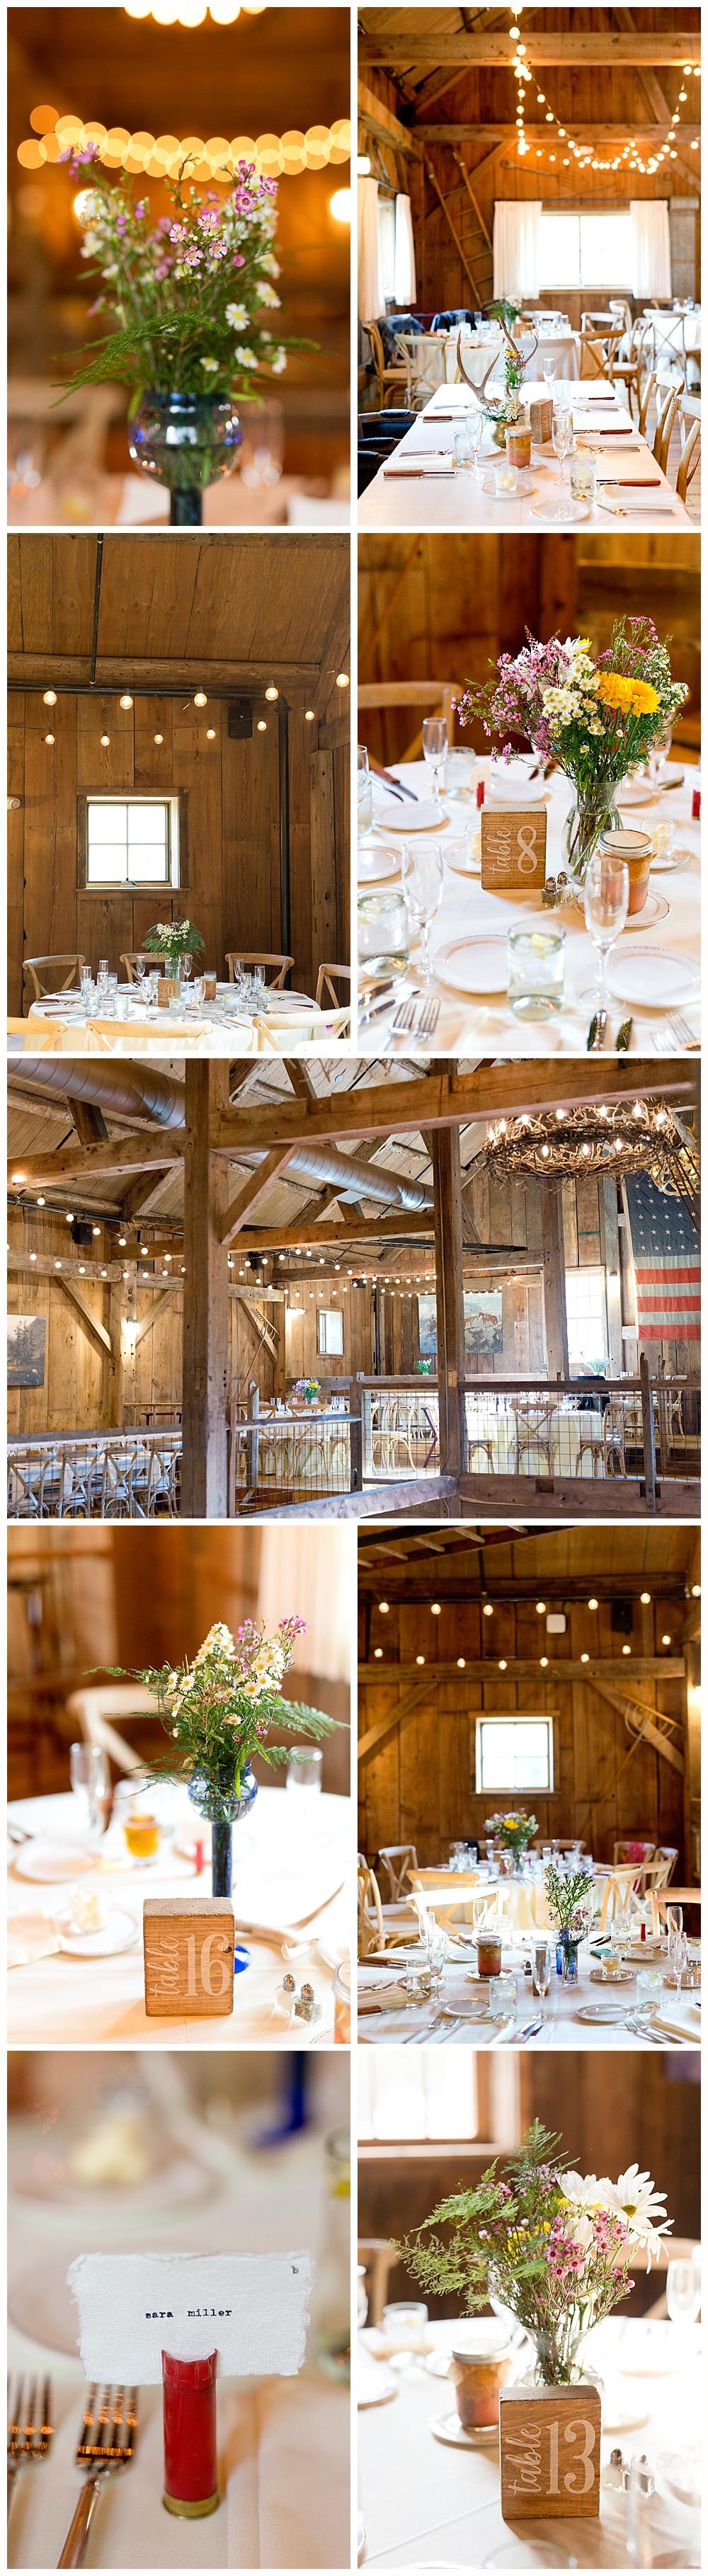 rustic barn wedding decorations at Holderness, NH wedding - The Barn on the Pemi wedding venue